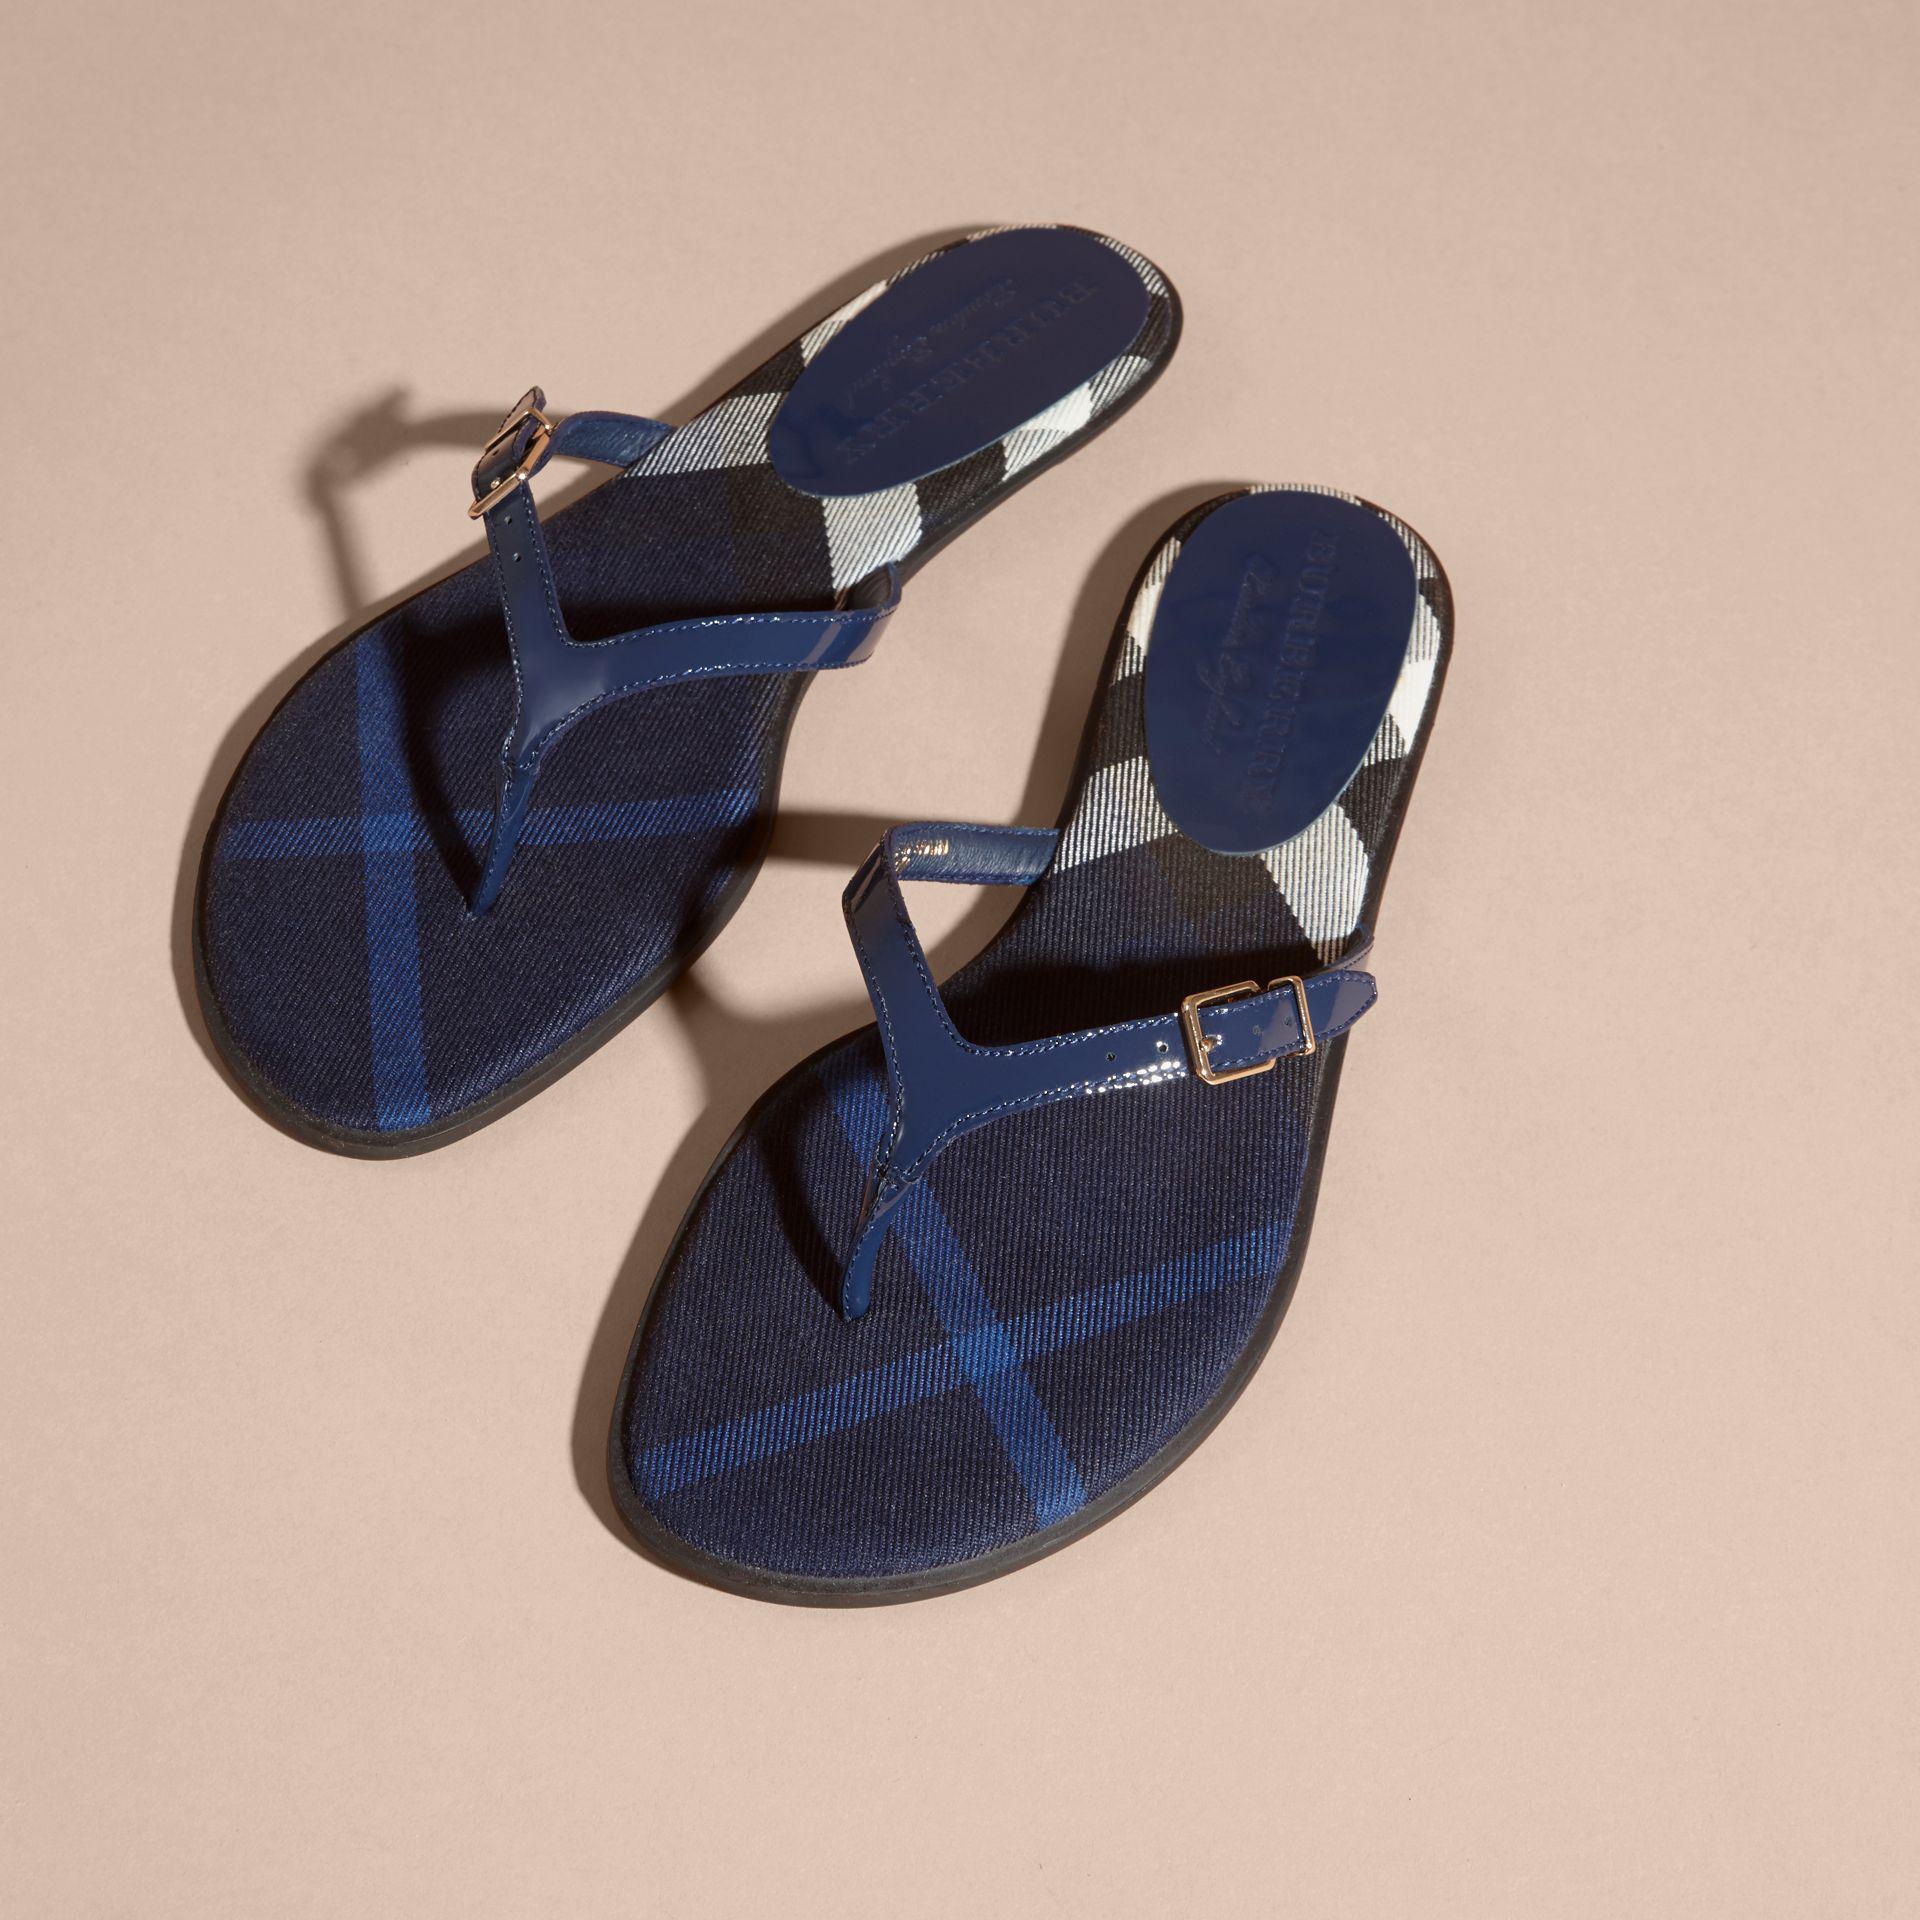 d51e704dd6de Lyst - Burberry House Check And Patent Leather Sandals Indigo Blue ...